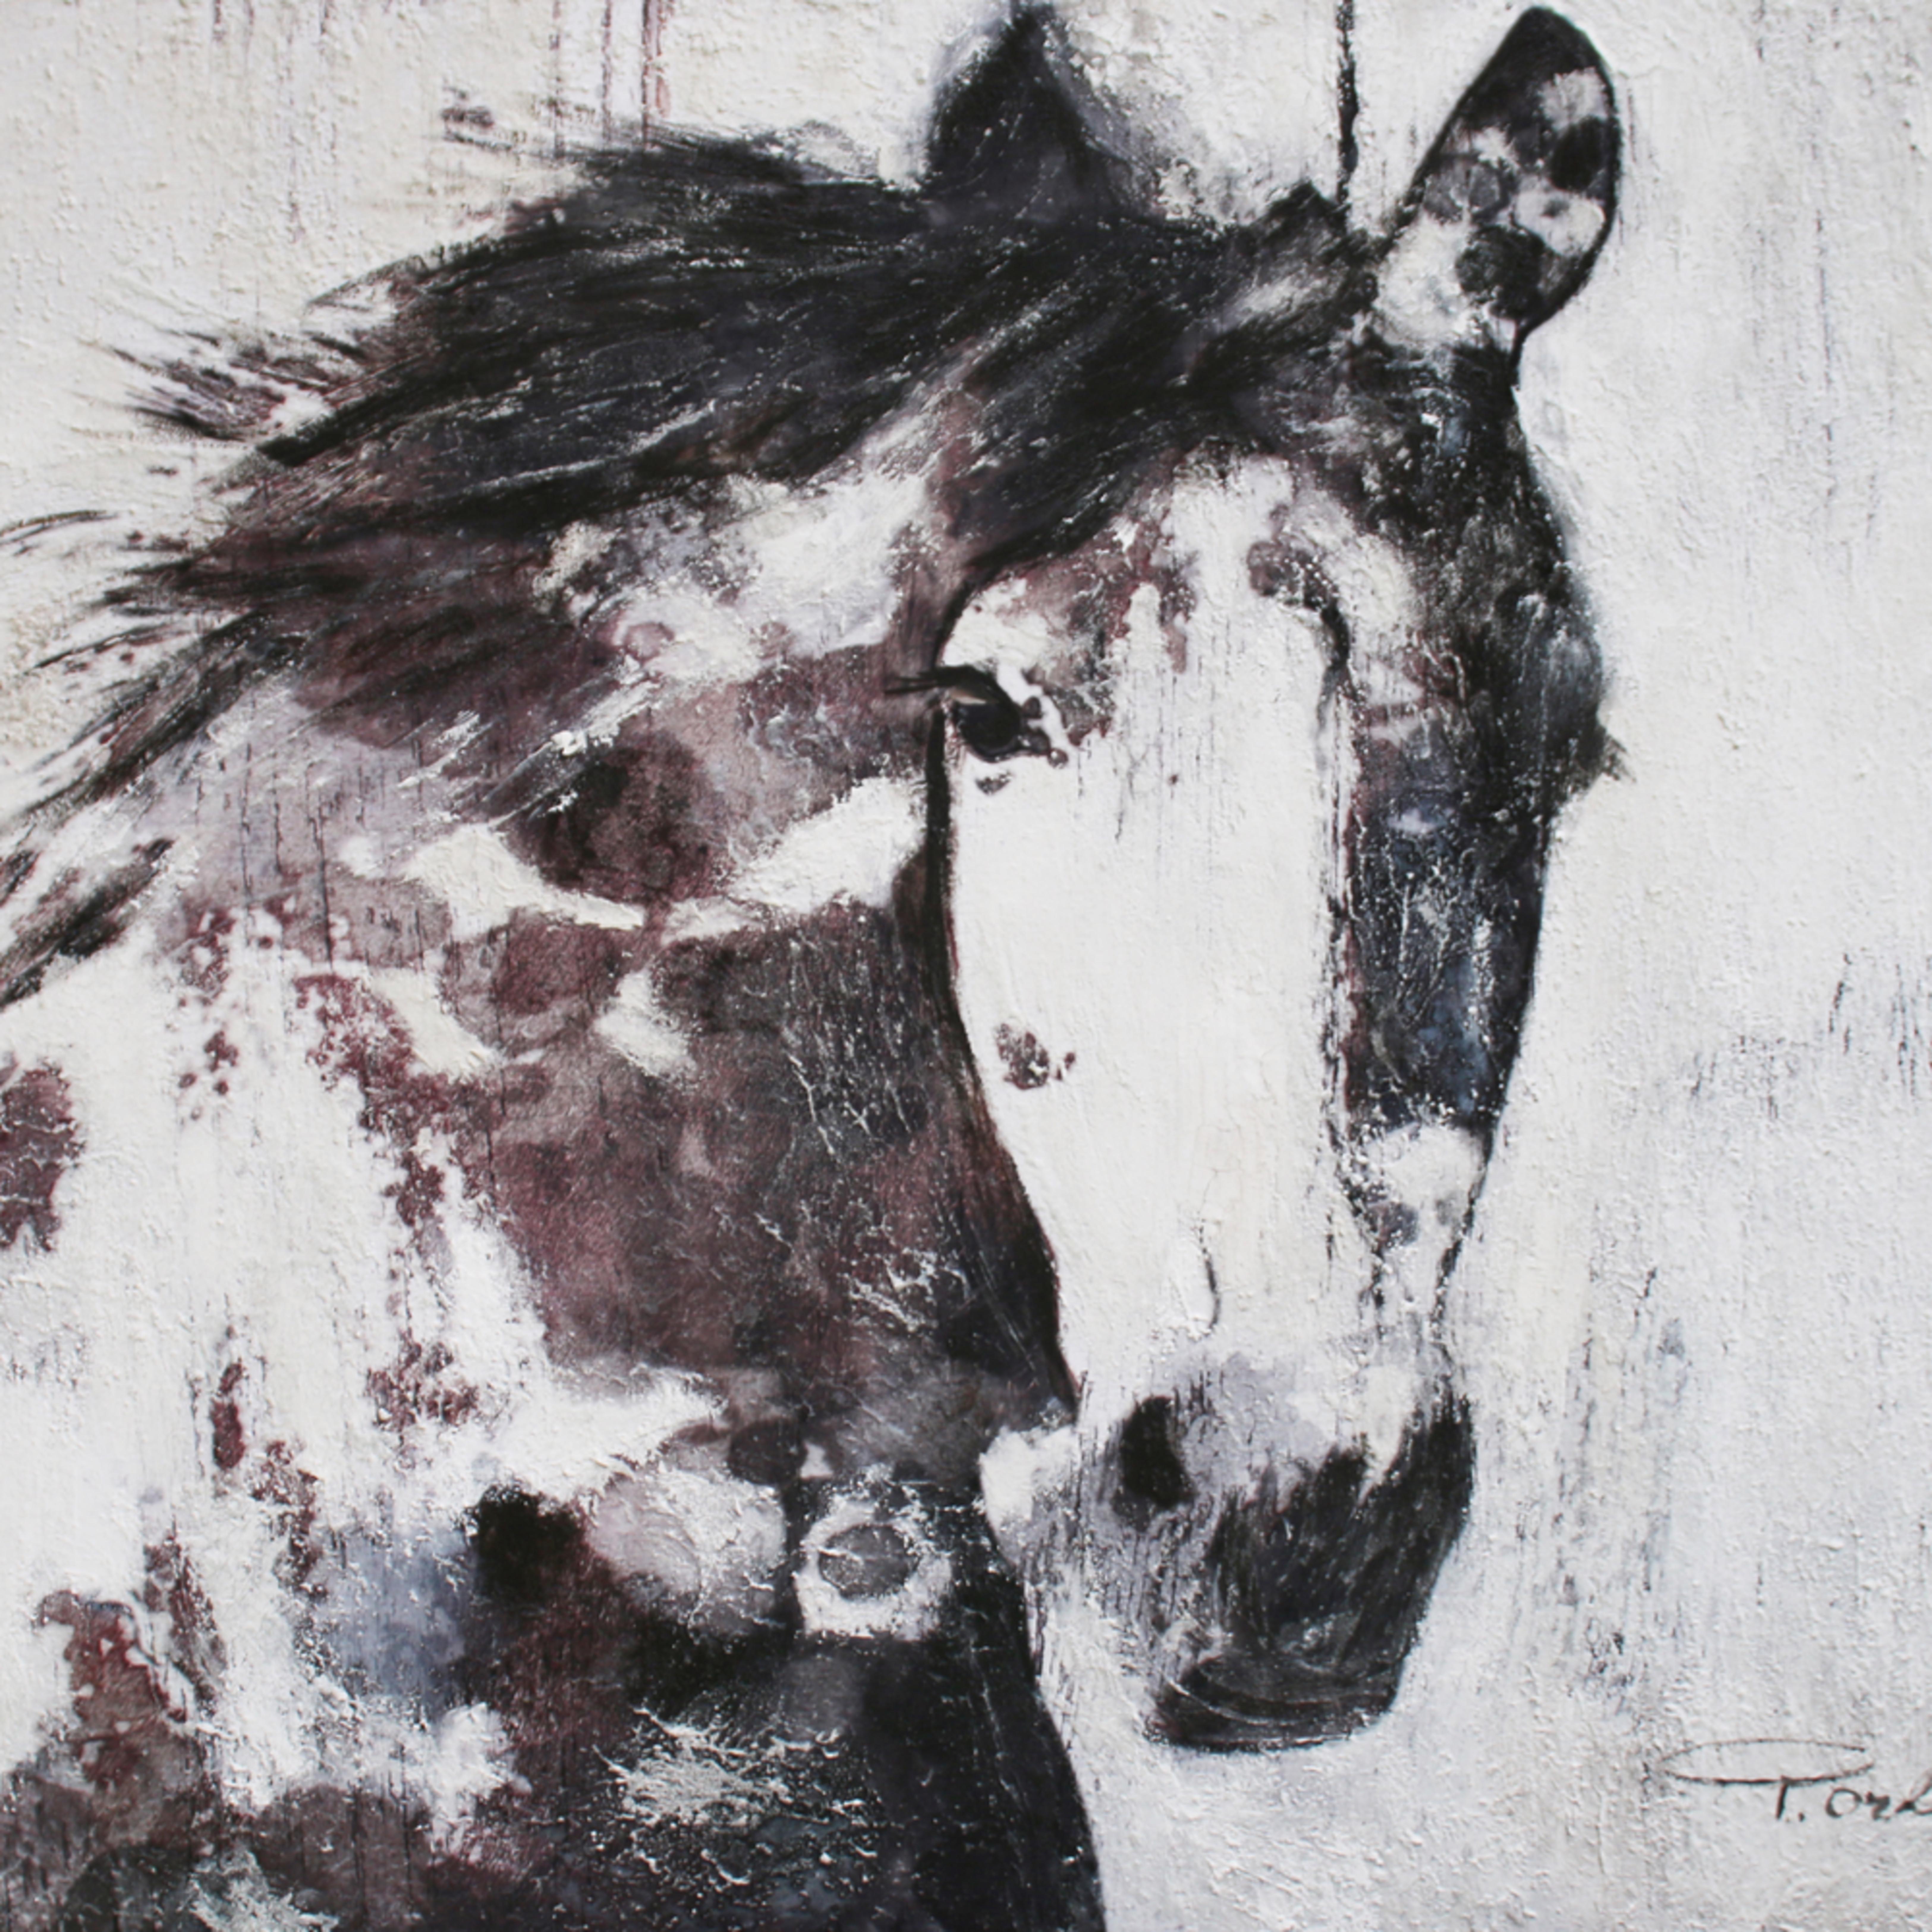 Orl 6144 15 gorgeous horse yov2rz